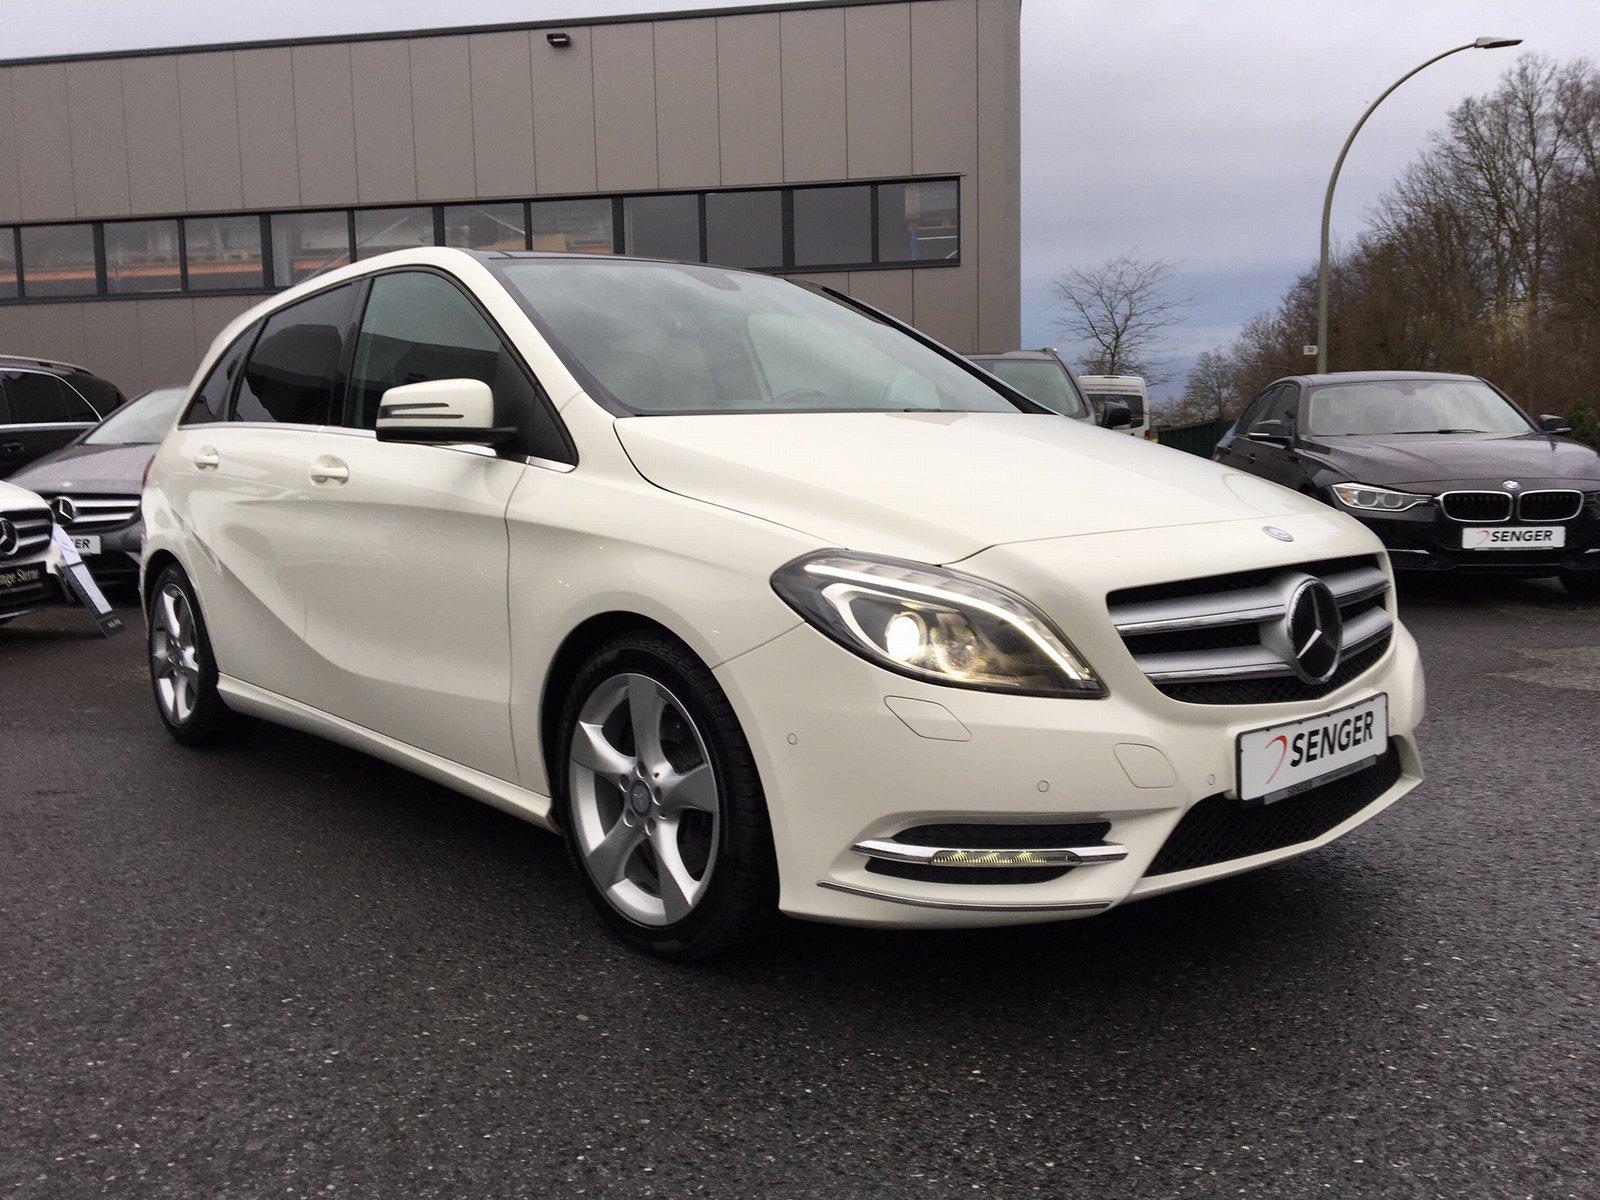 Mercedes-Benz B 220 CDI *Sport-Paket*7G-DCT*Panorama*Xenon*PTS, Jahr 2014, diesel